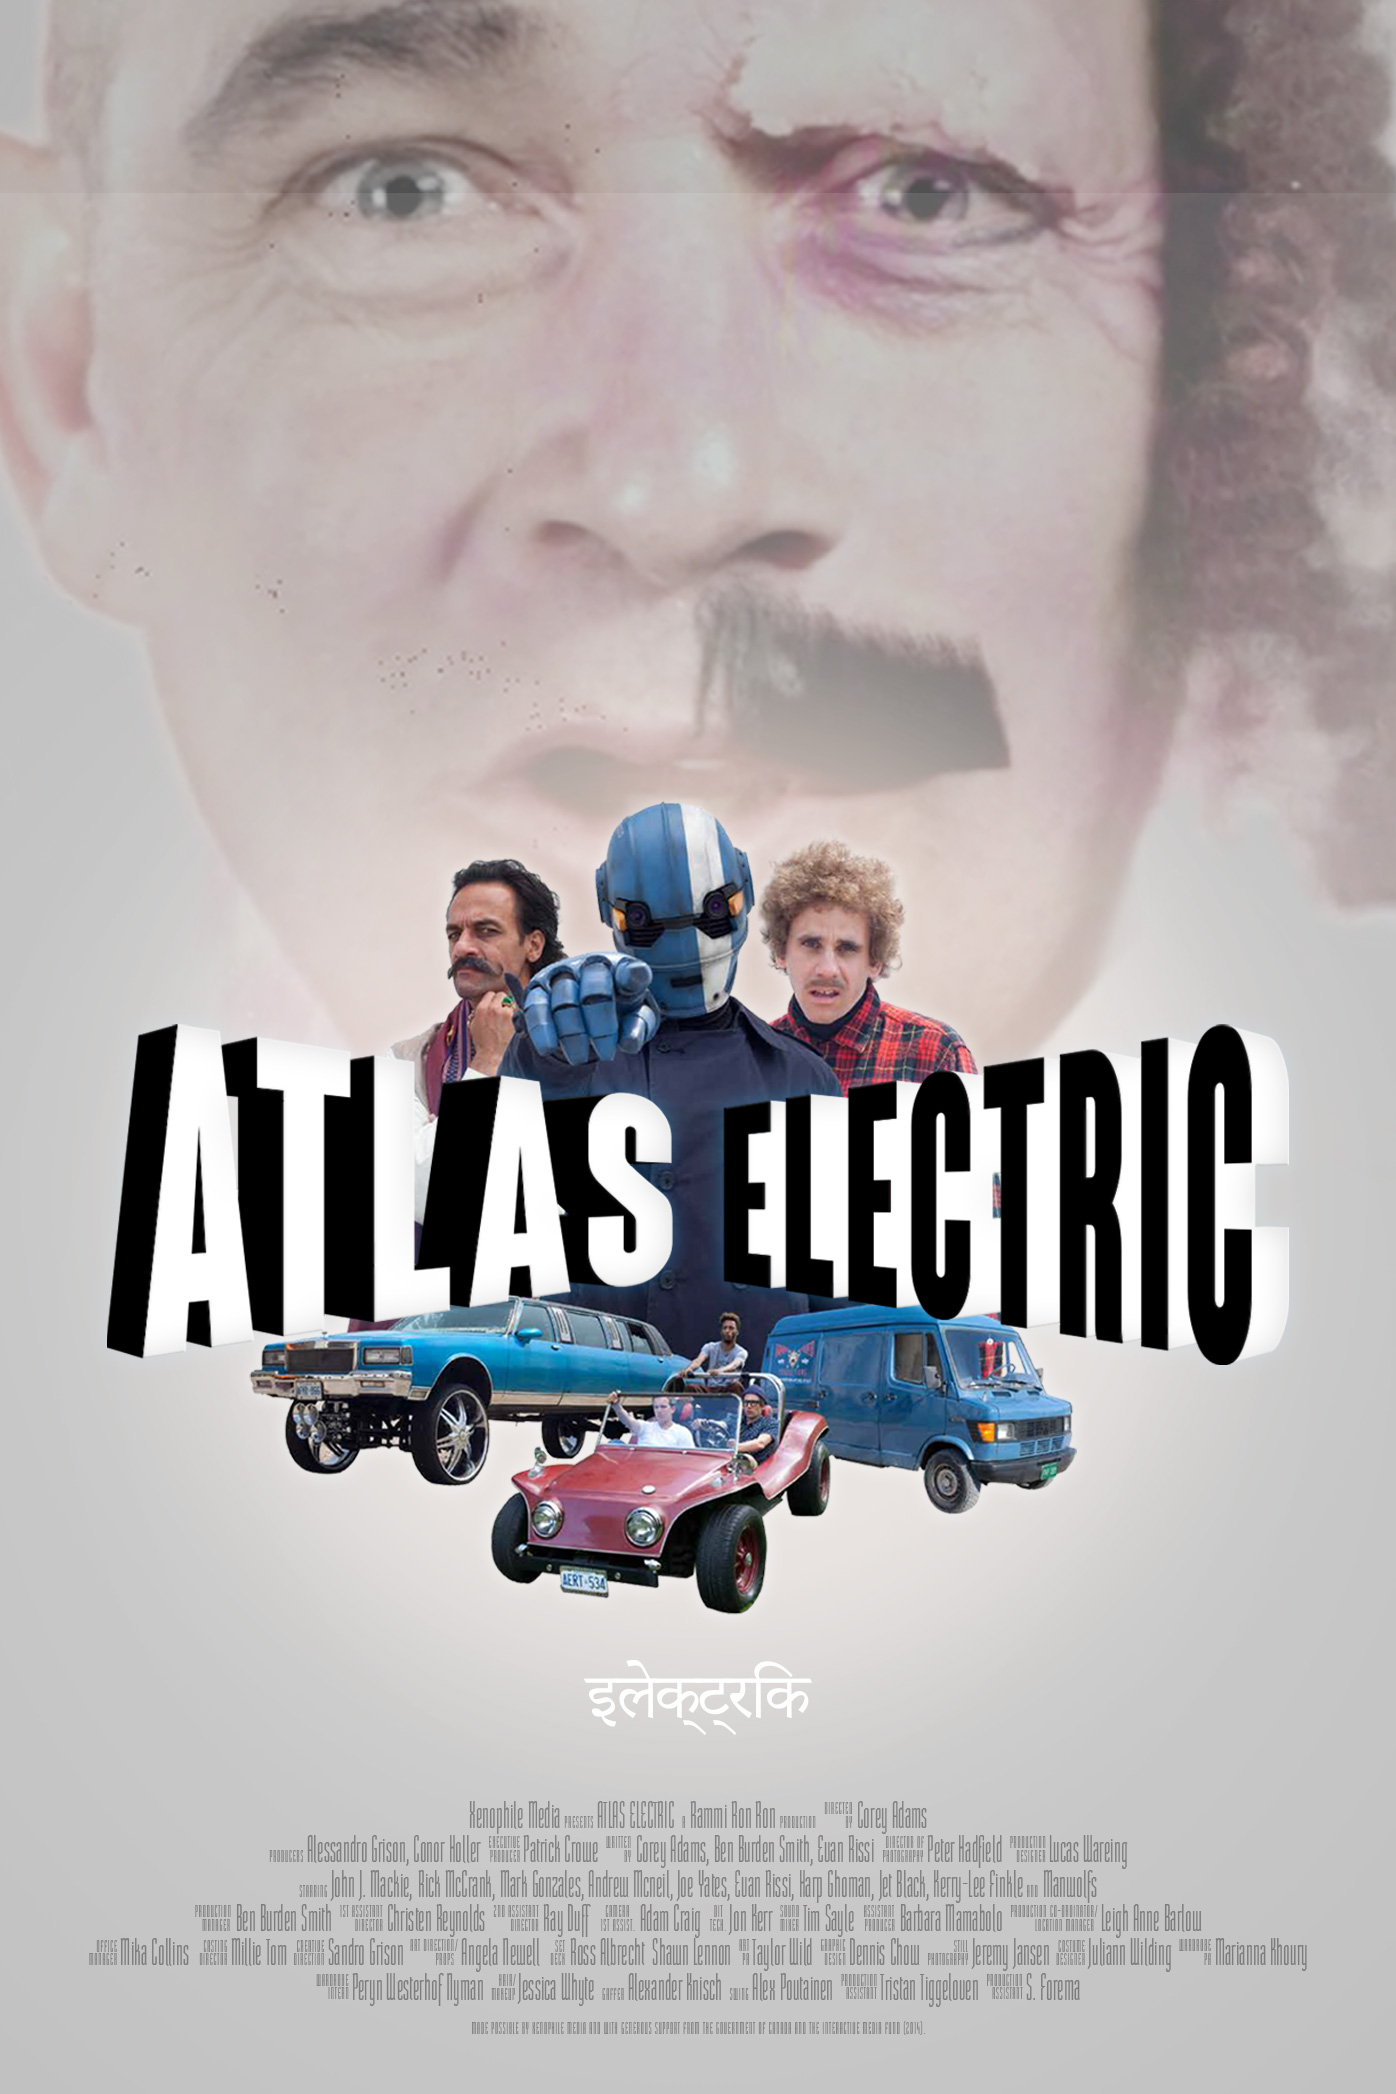 Atlas-graphic-website-poster.jpg